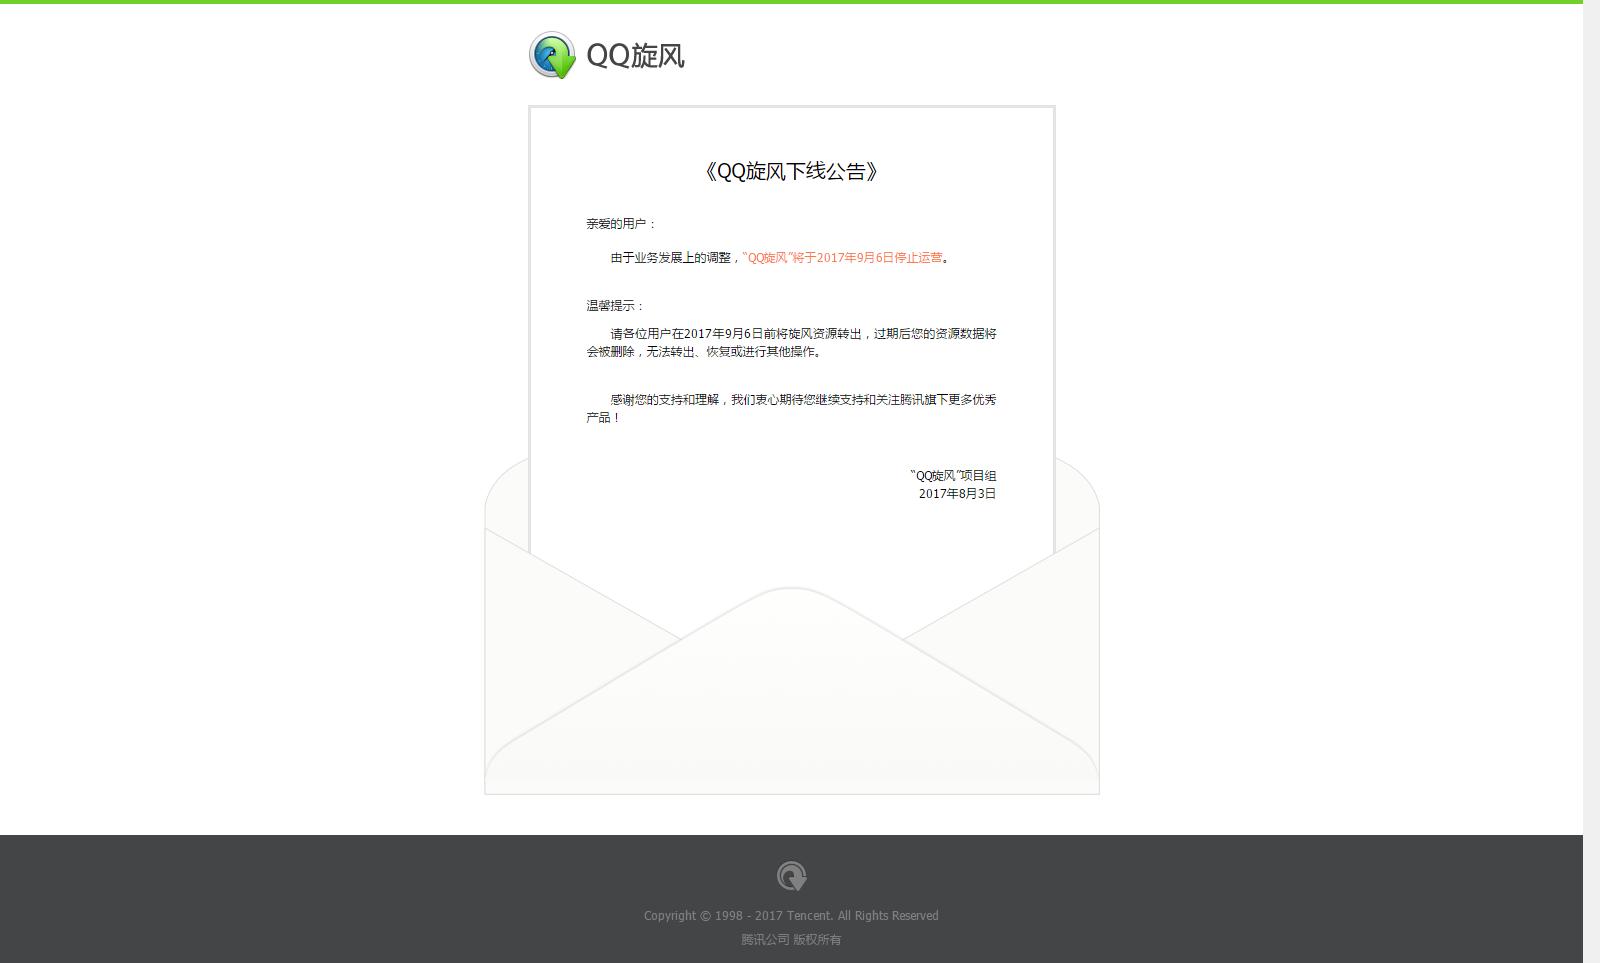 QQ旋风将于2017年9月6日下线